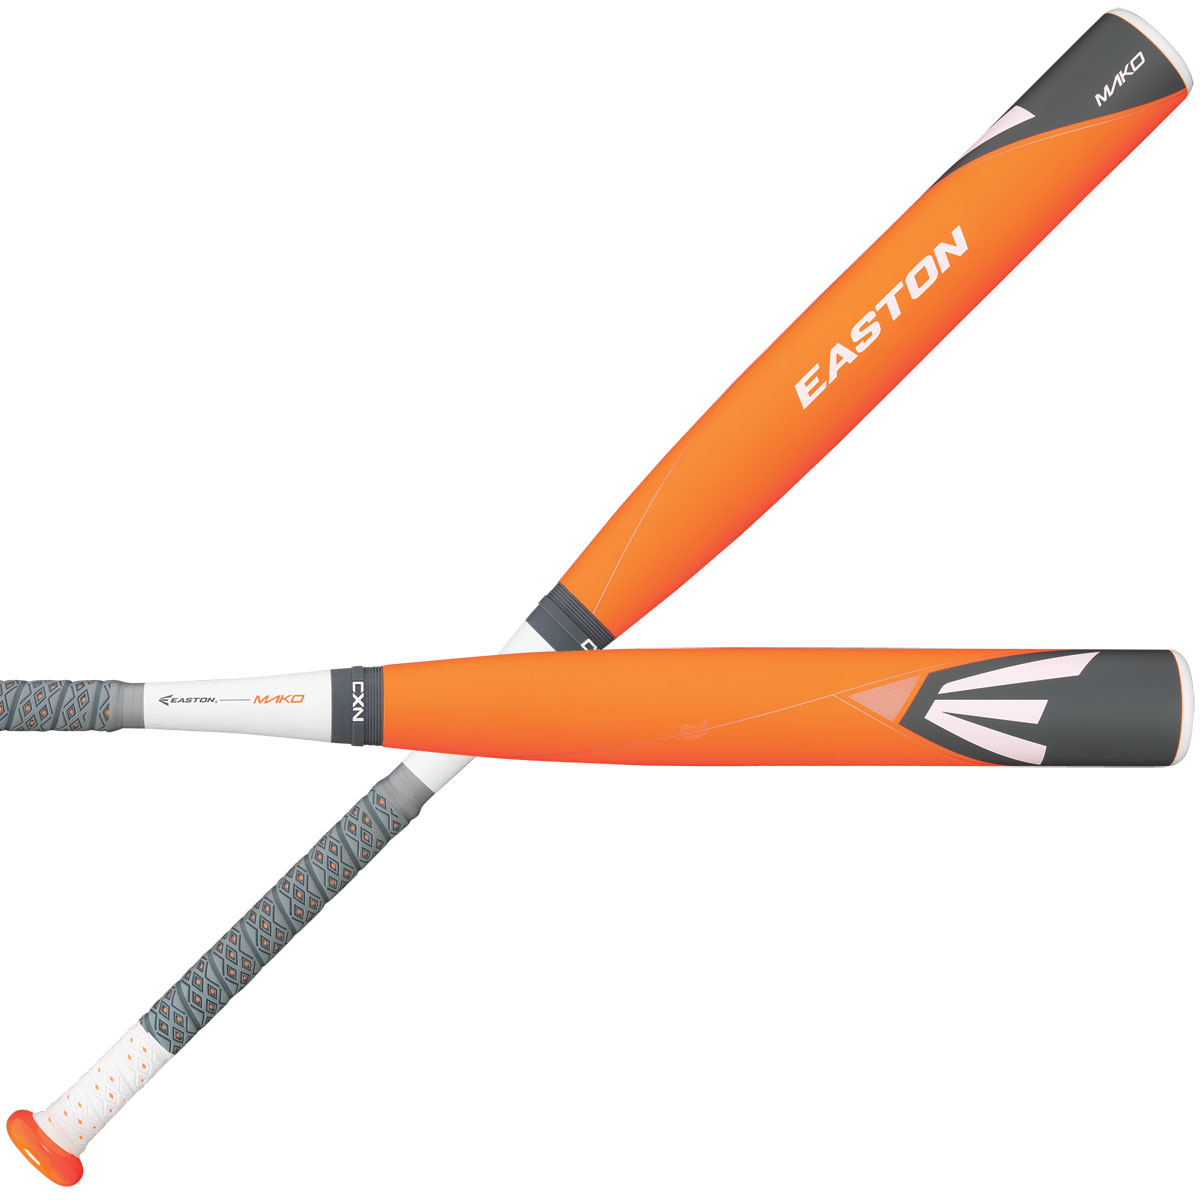 Easton mako power brigade 11 yb14mk youth baseball bat for The easton